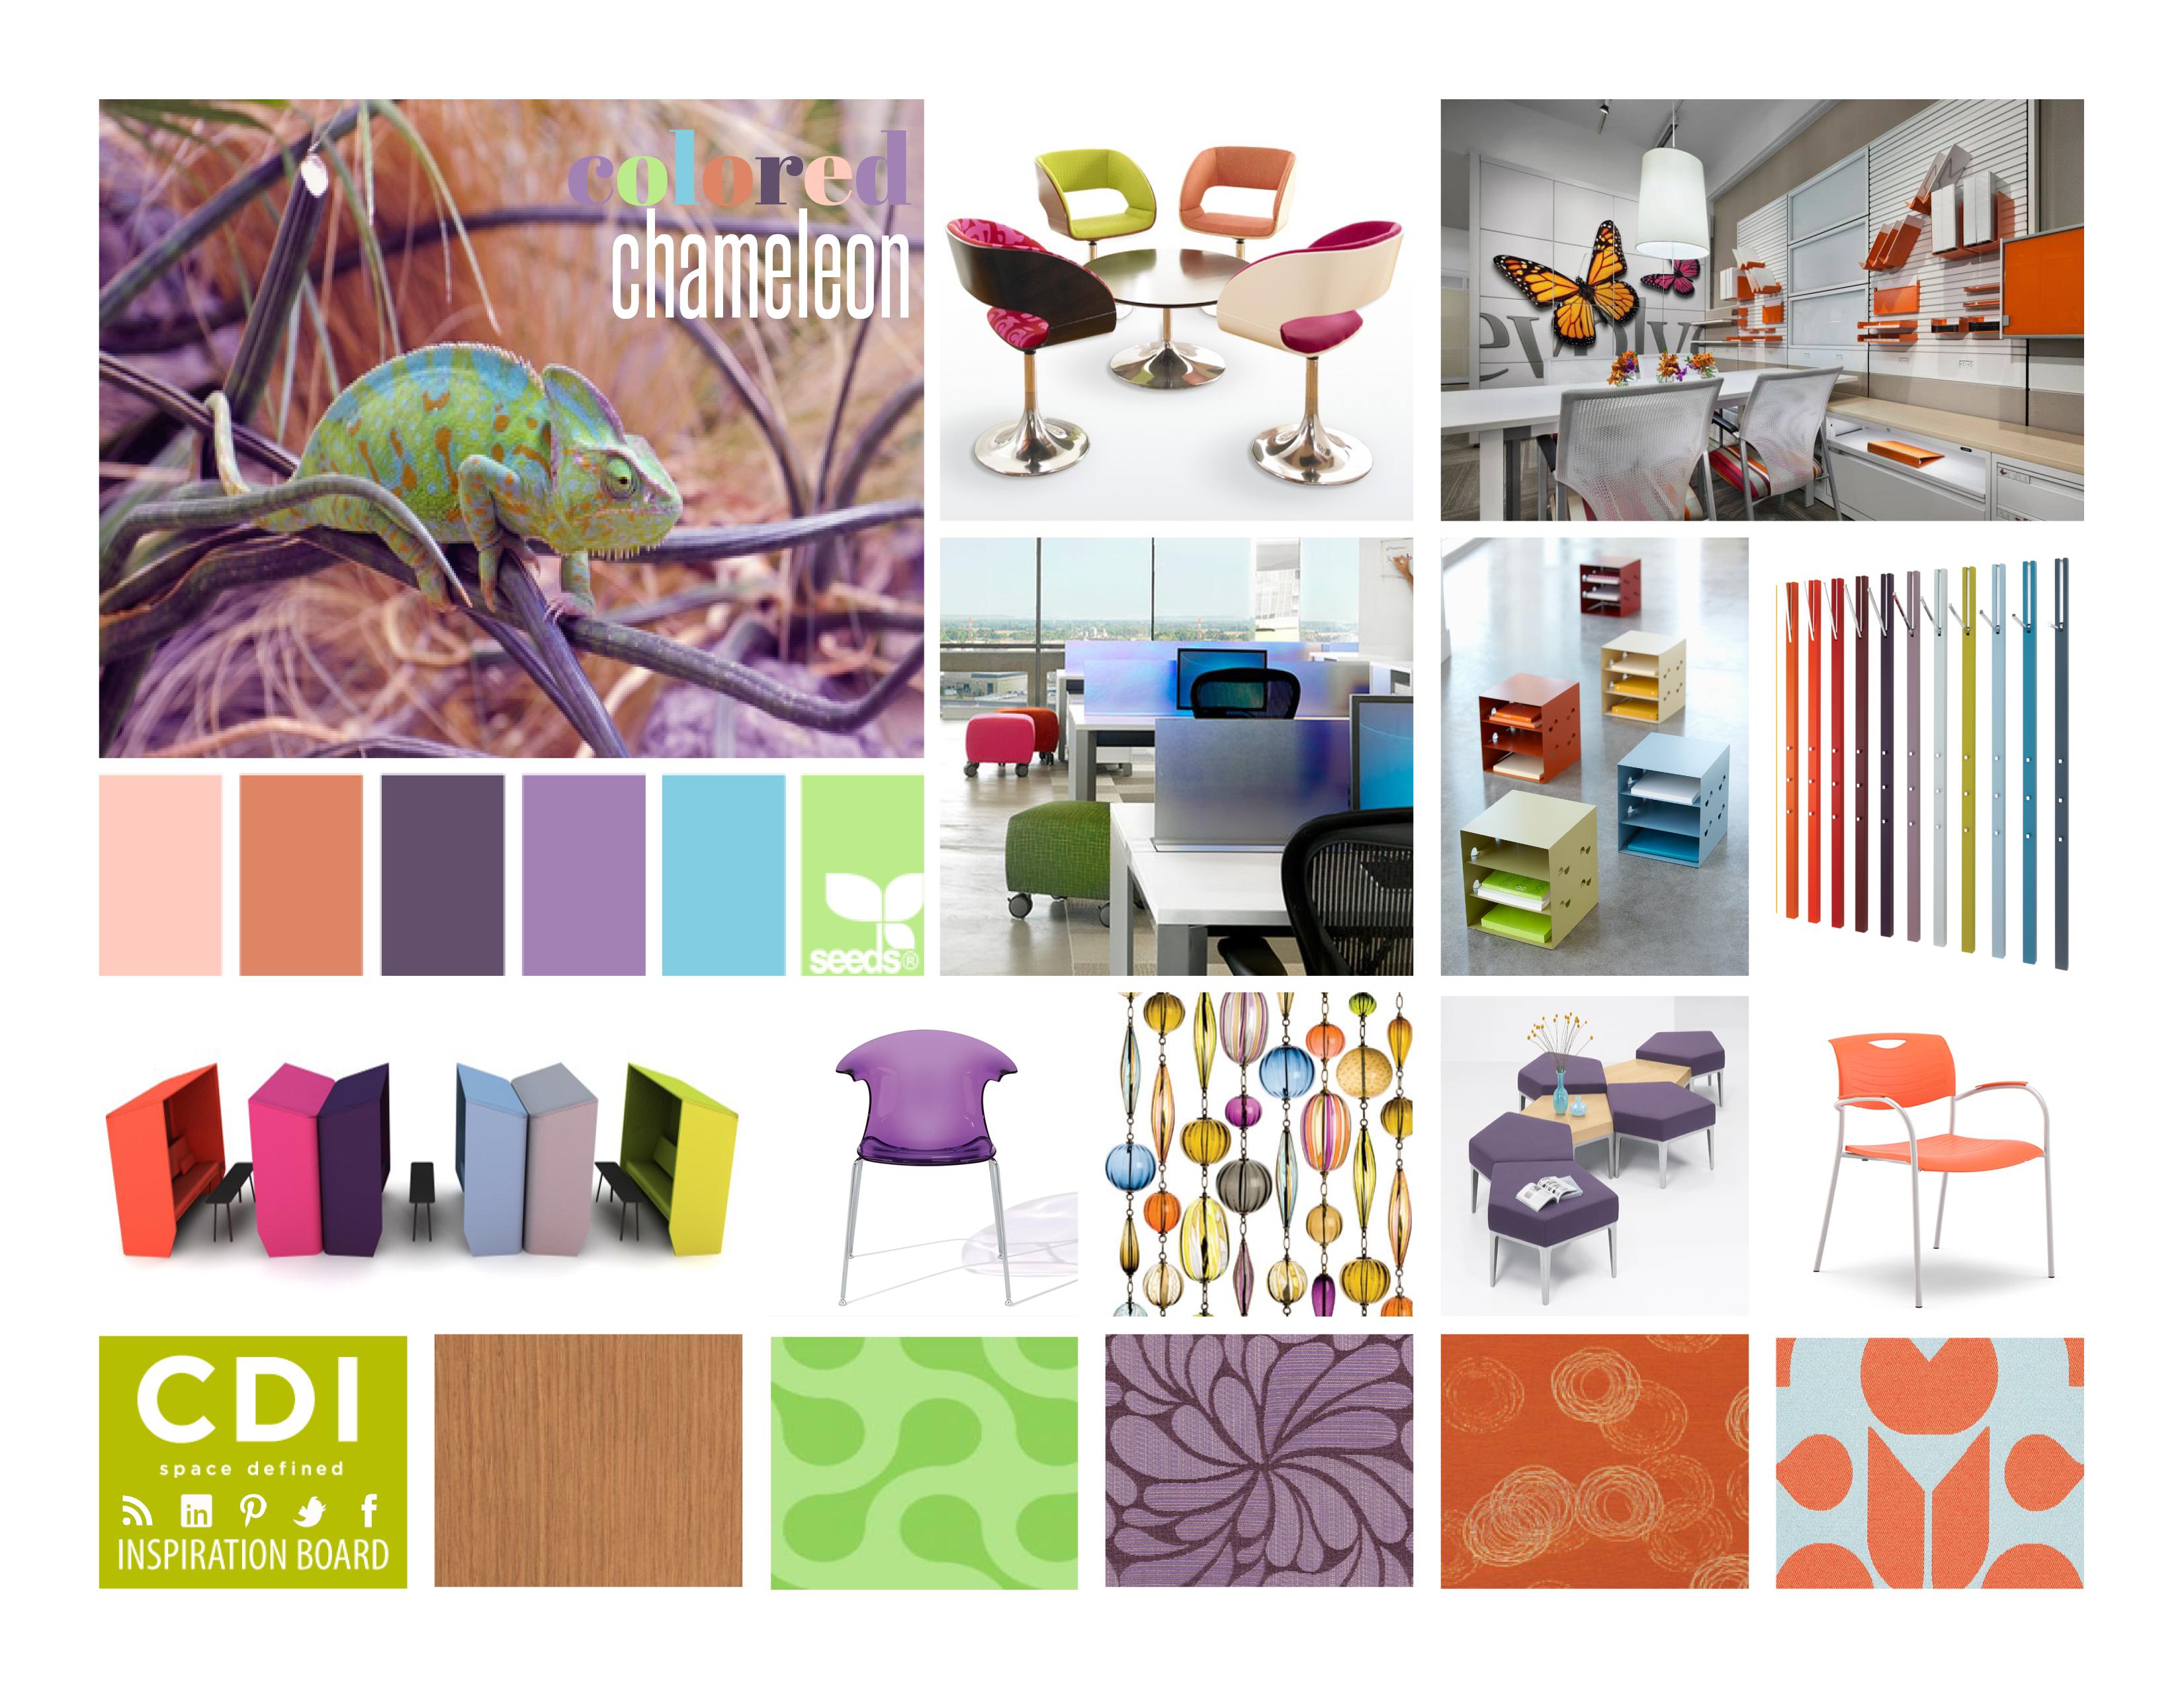 Inspiration Board Colored Chameleon CDI BLOG